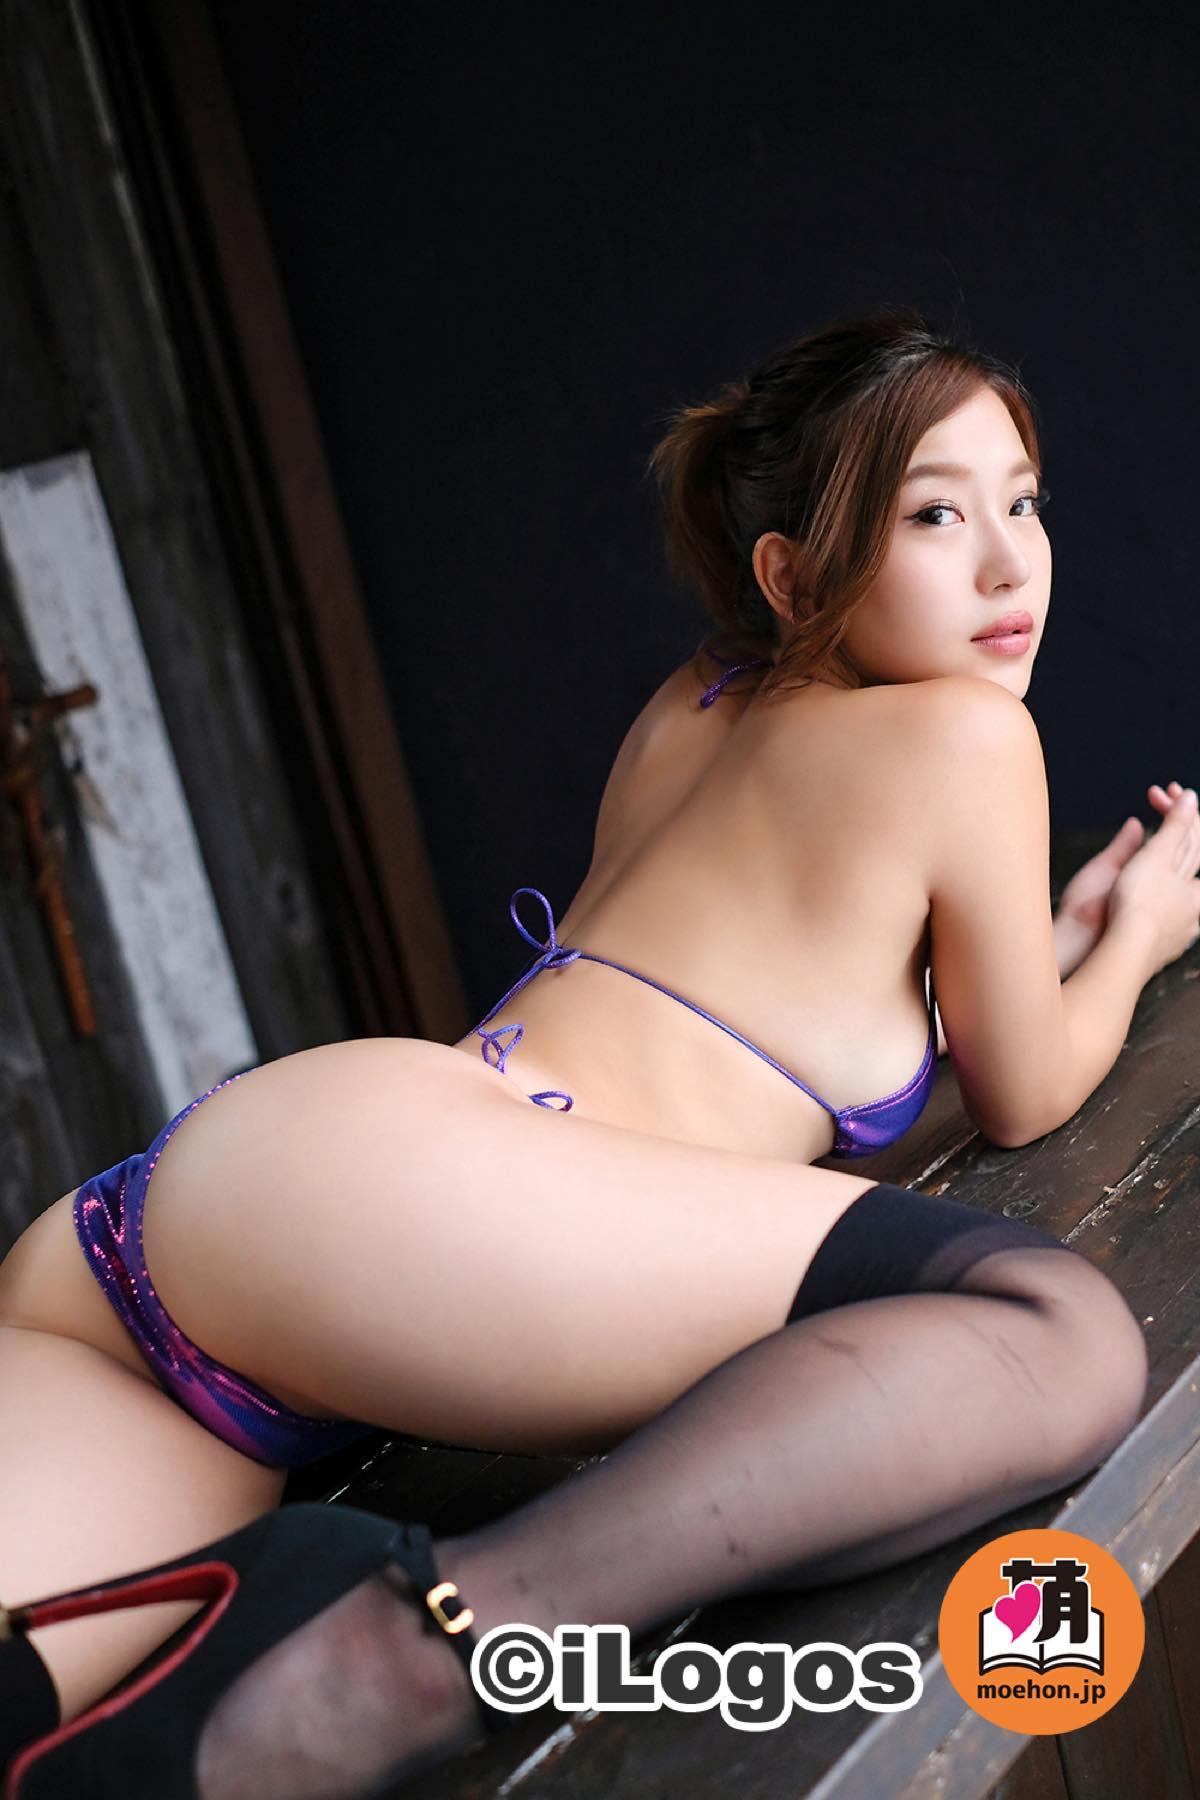 COCO「腹筋美女」ダンスで鍛え上げた絶品ボディ003